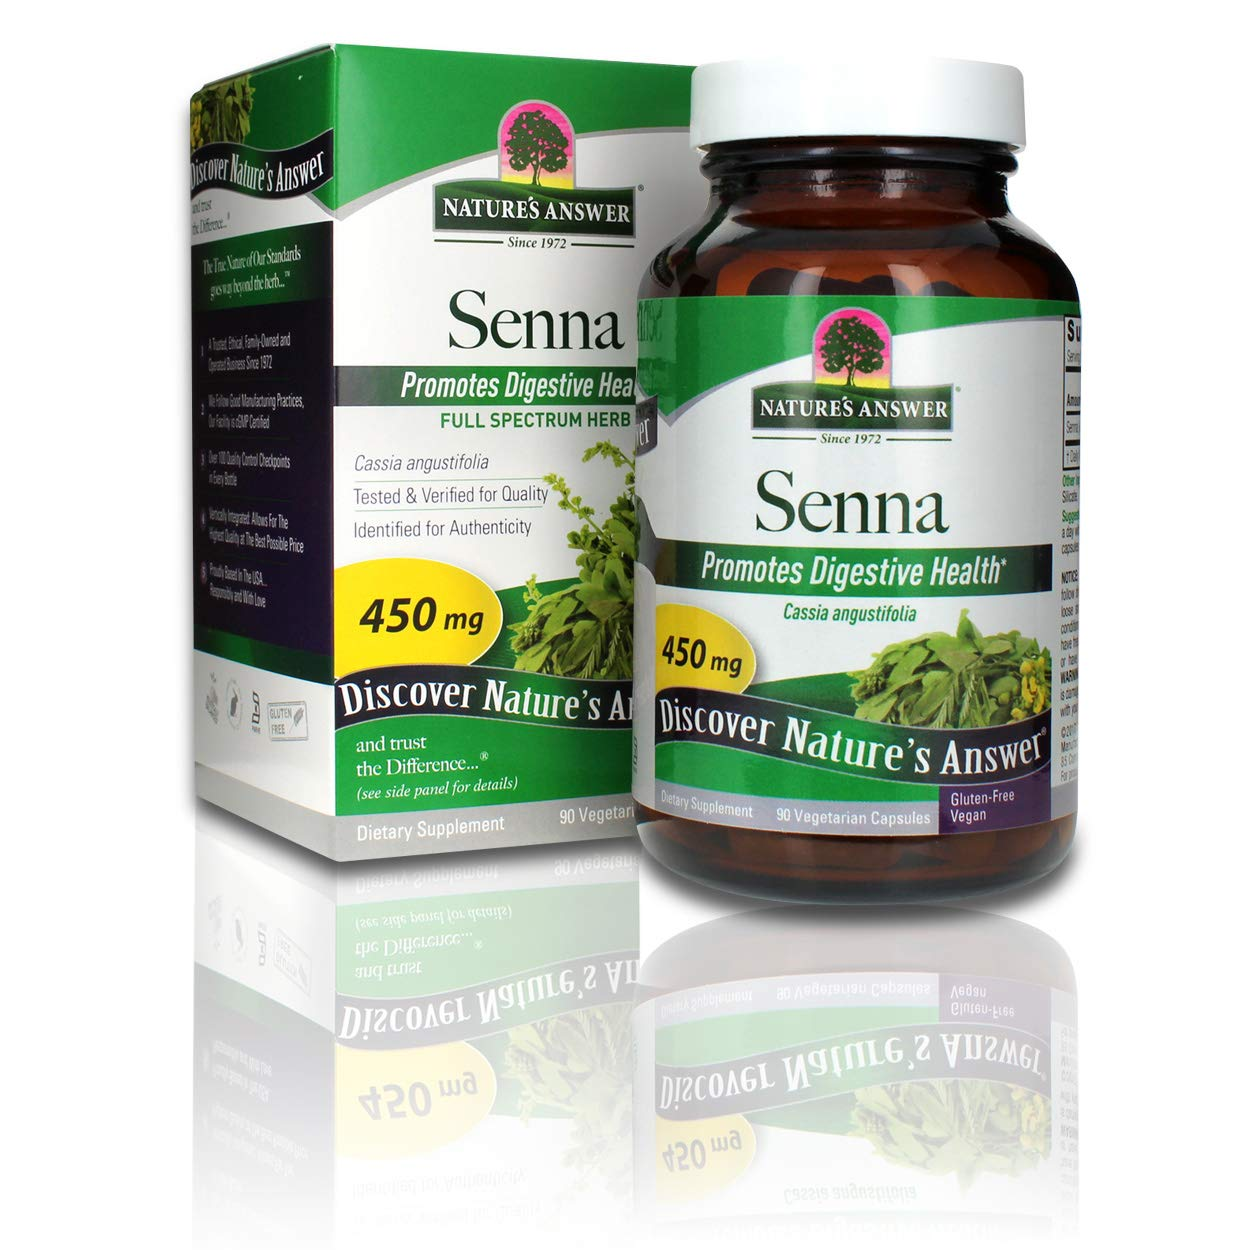 Nature's Answer Senna Leaf   Dietary Supplement   Promotes Digestive Health   Vegan, Gluten-Free & Kosher Certified   Vegetarian Capsules 90ct